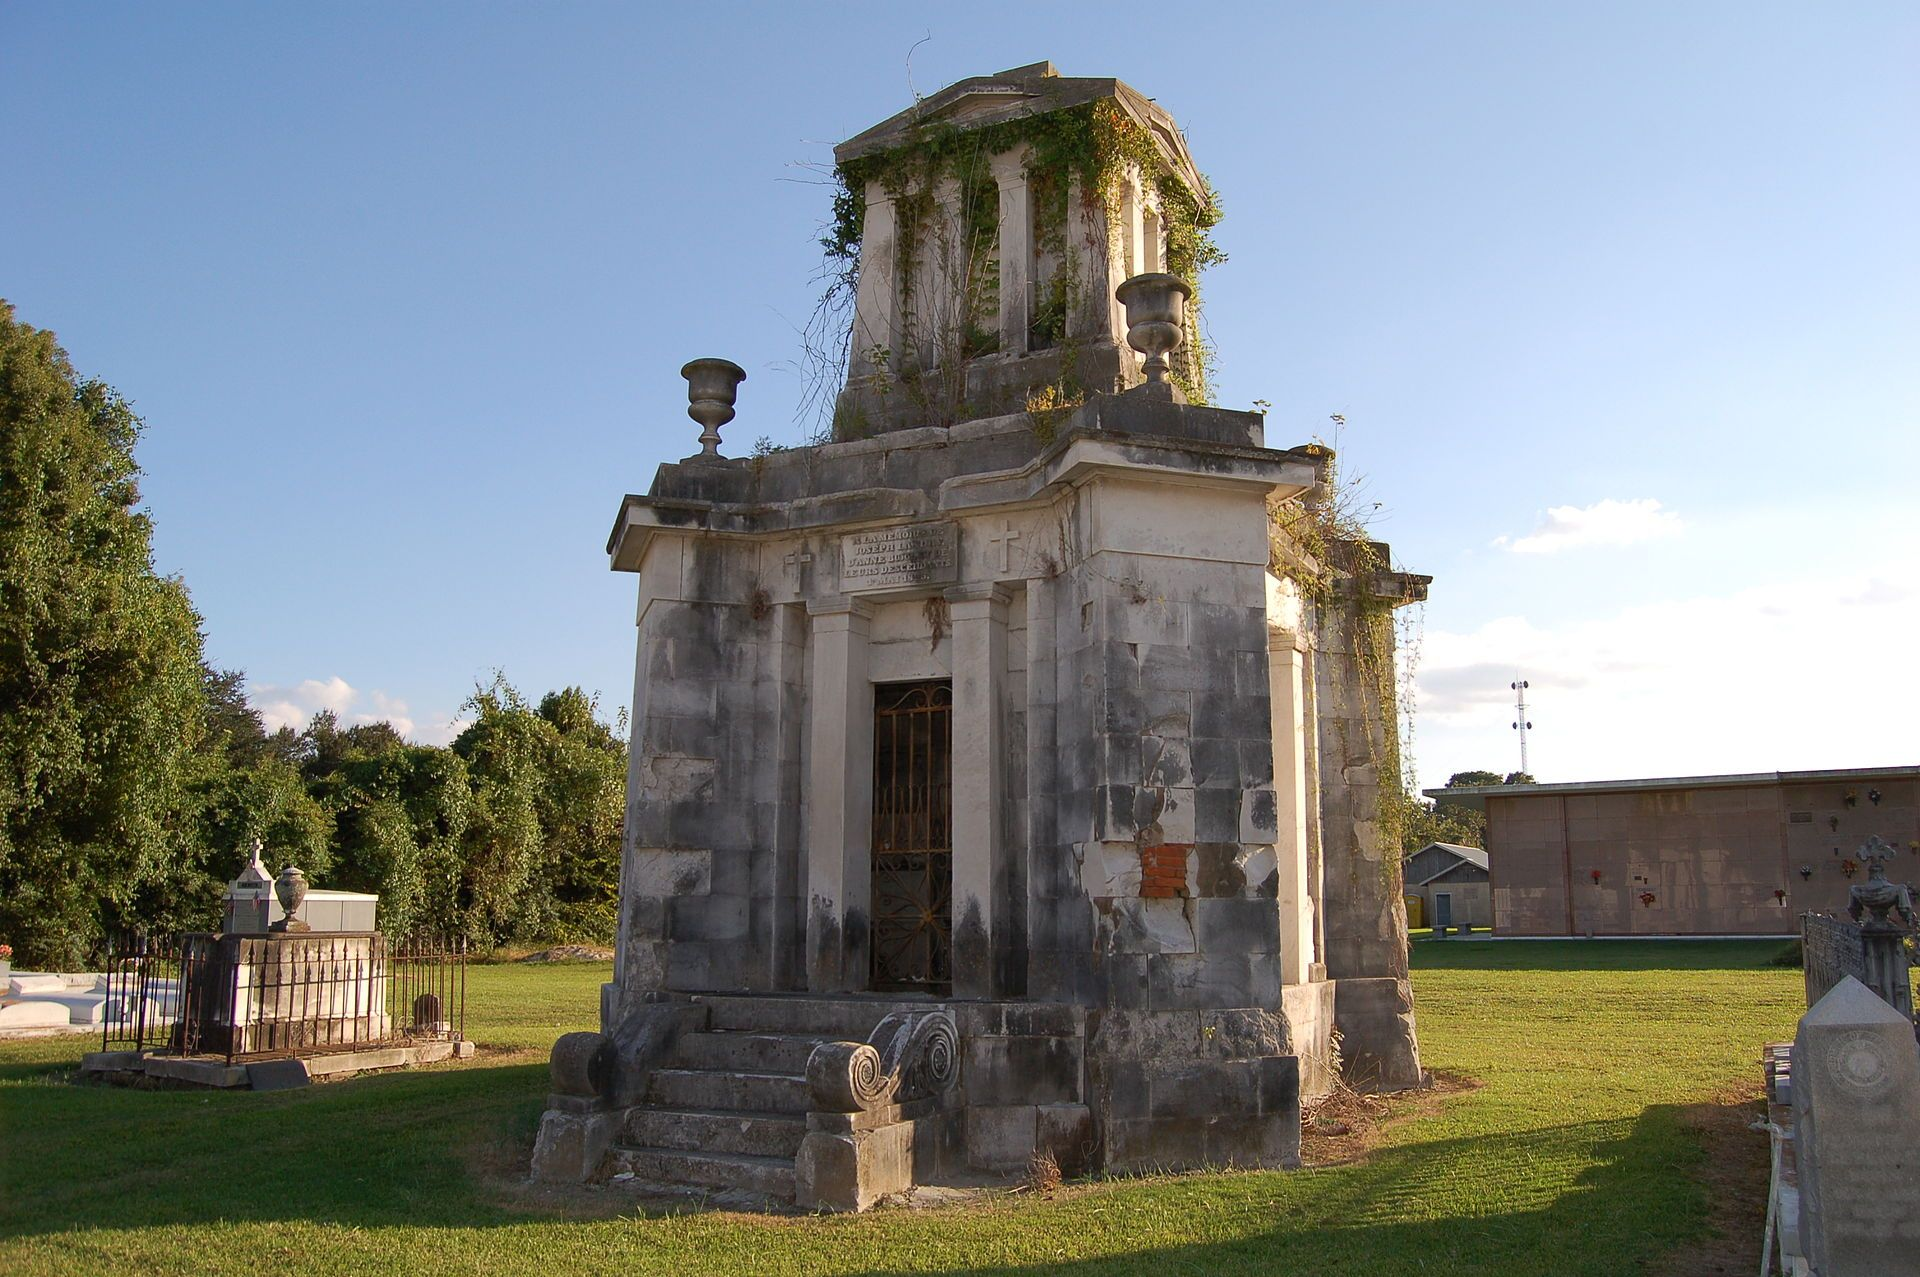 052dc8da18a0b877d8103a4fec51d85a - Southern Memorial Gardens Cemetery Baton Rouge